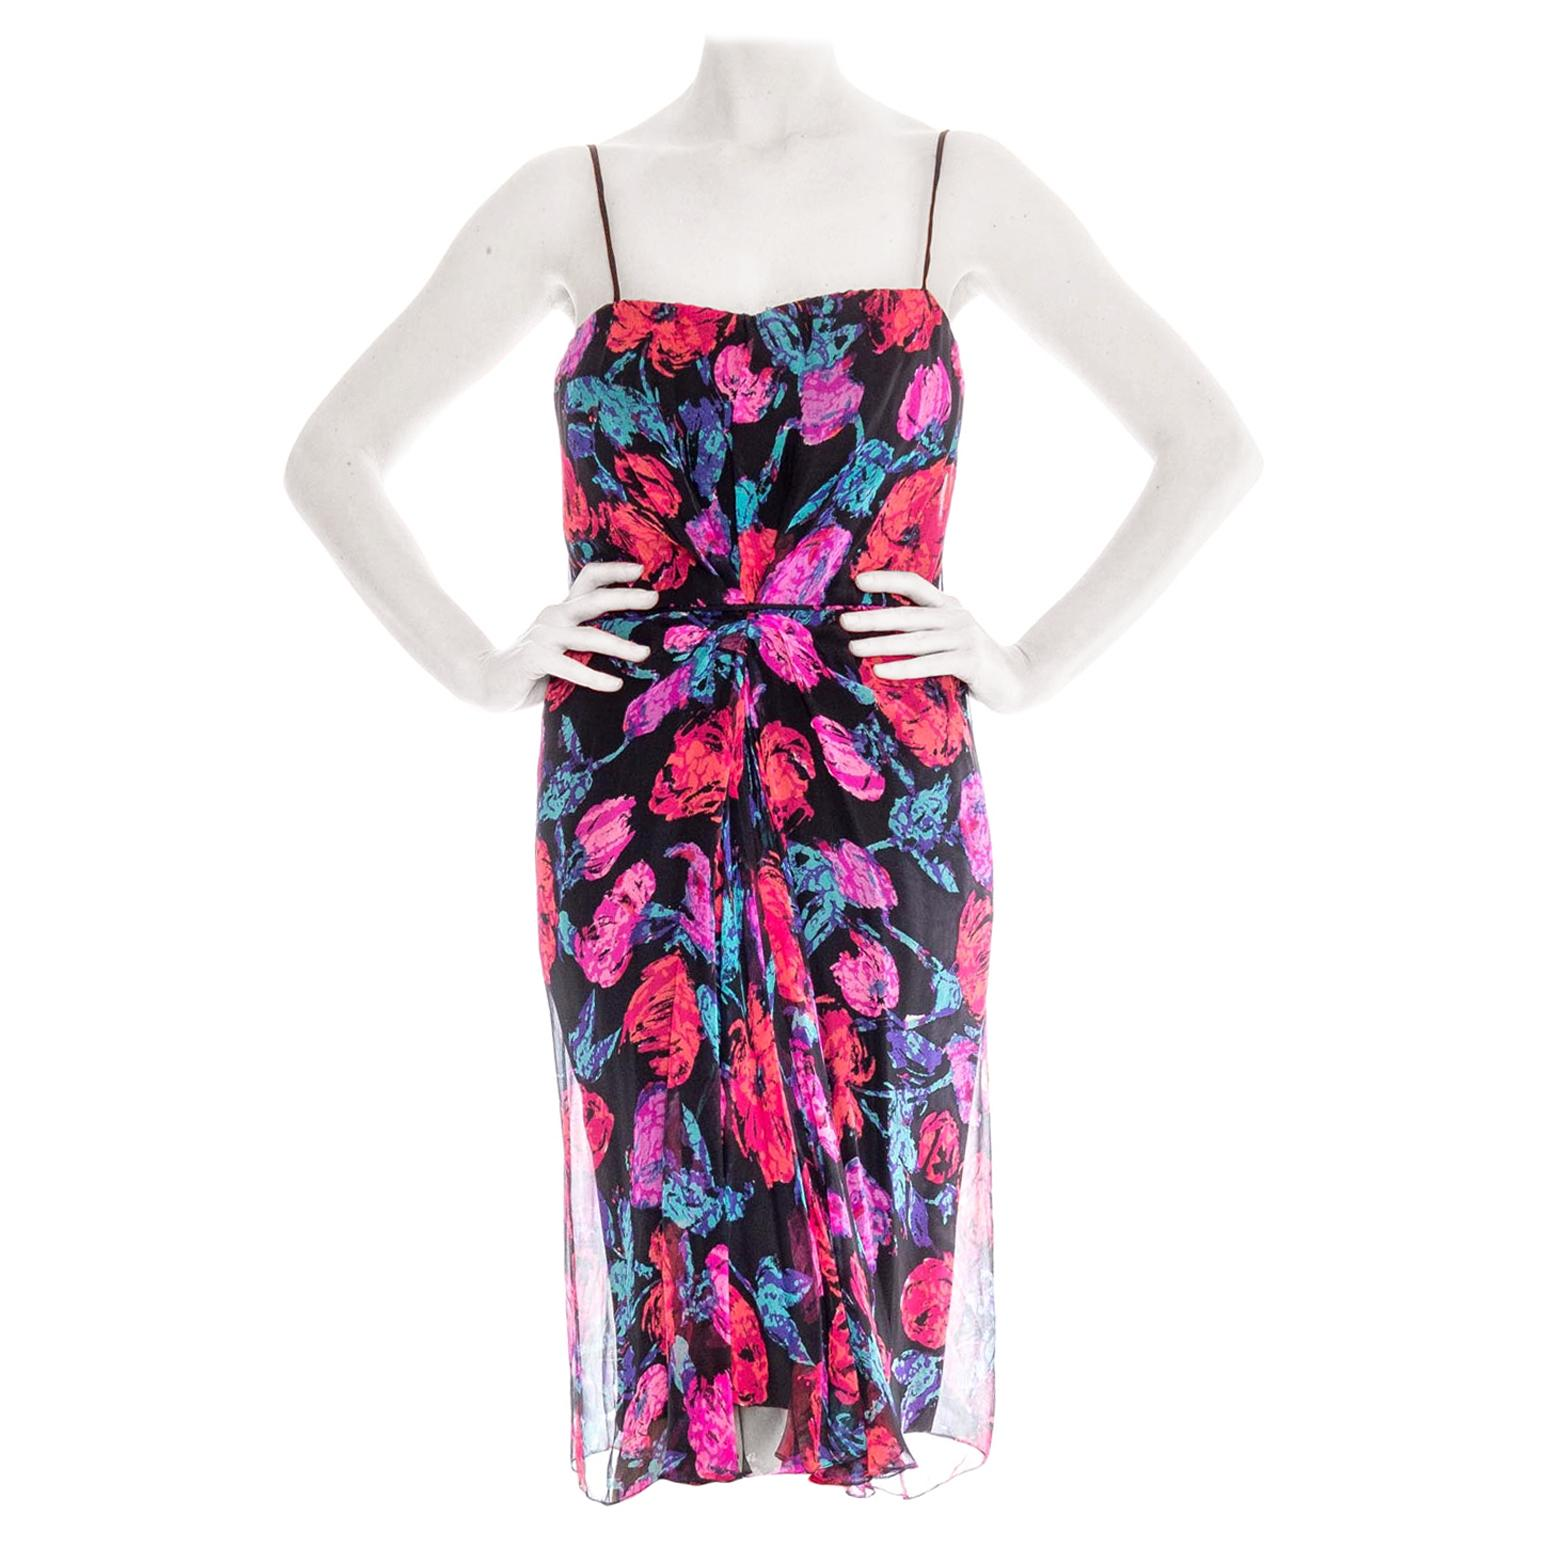 1950S FRANK STARR Silk Chiffon Floral Cocktail Dress